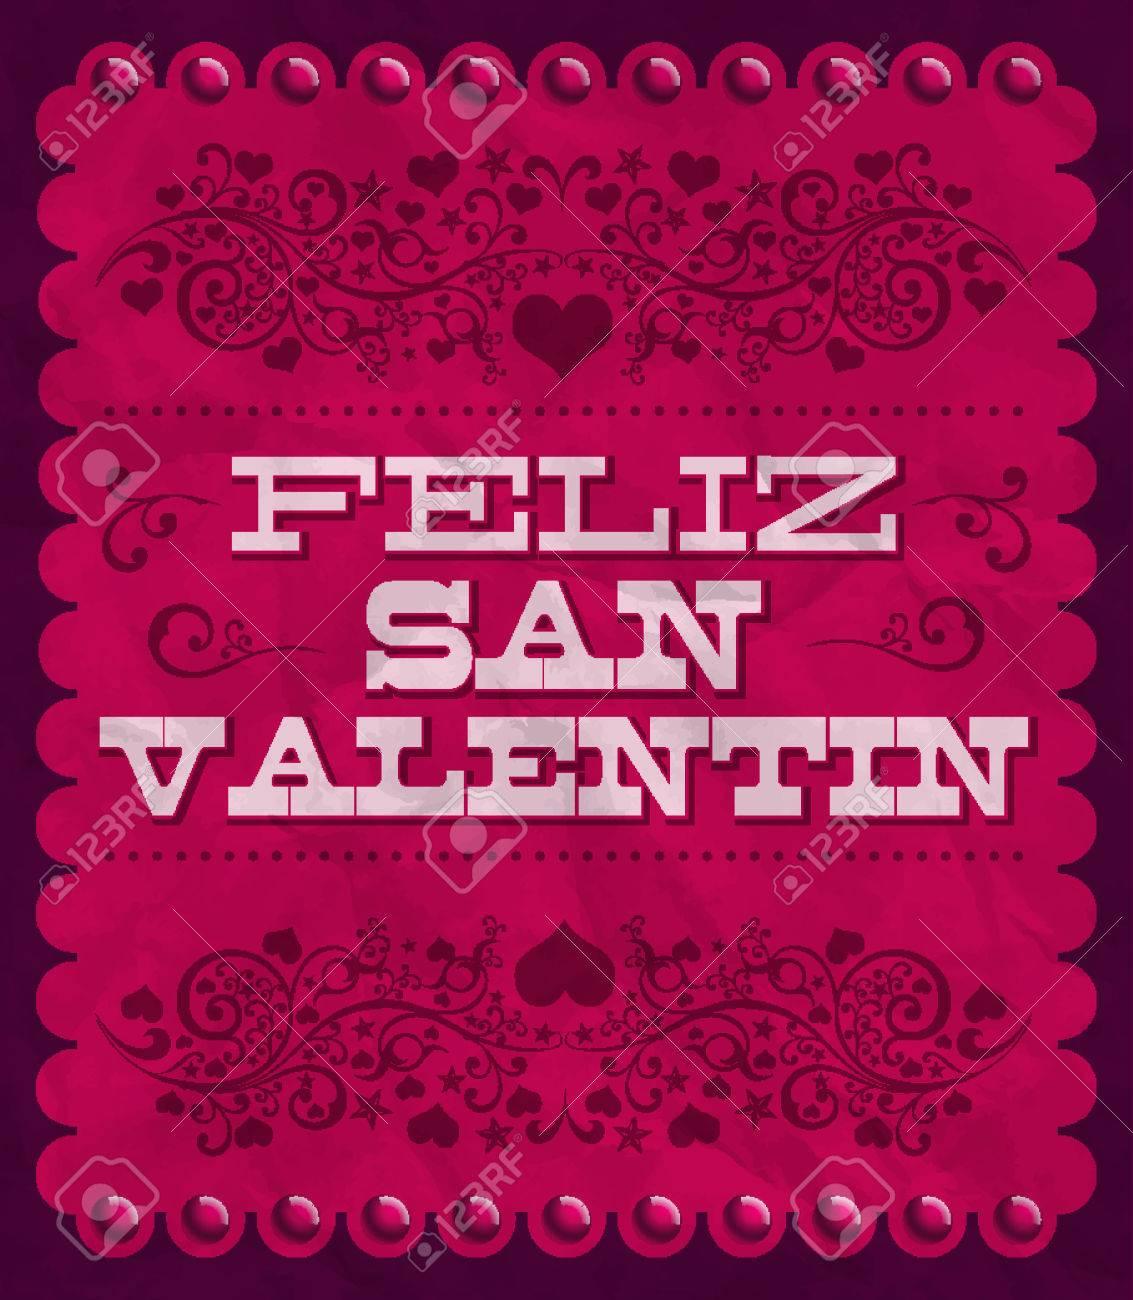 Feliz Dia de San Valentin - Happy Valentines day spanish text - vintage  vector card -